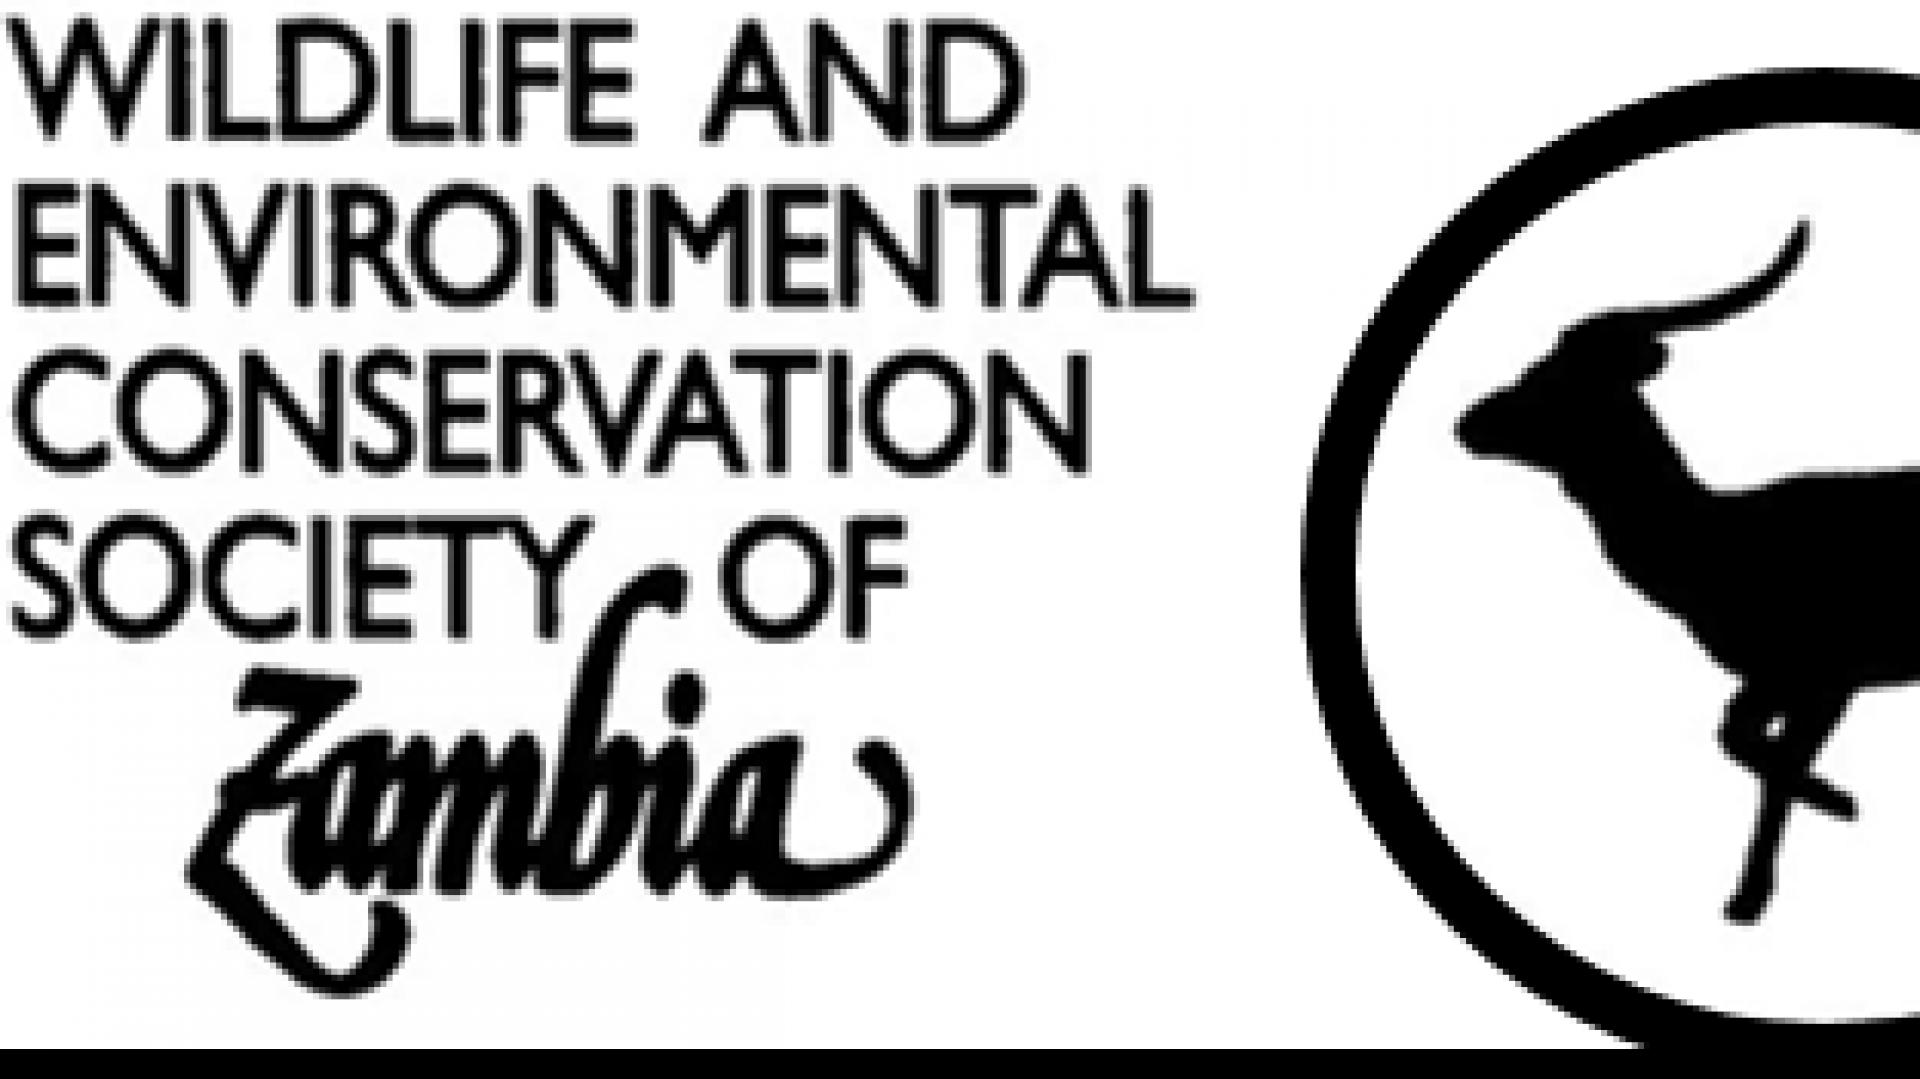 Wildlife and Environmental Conservation Society Of Zambia (WECSZ)